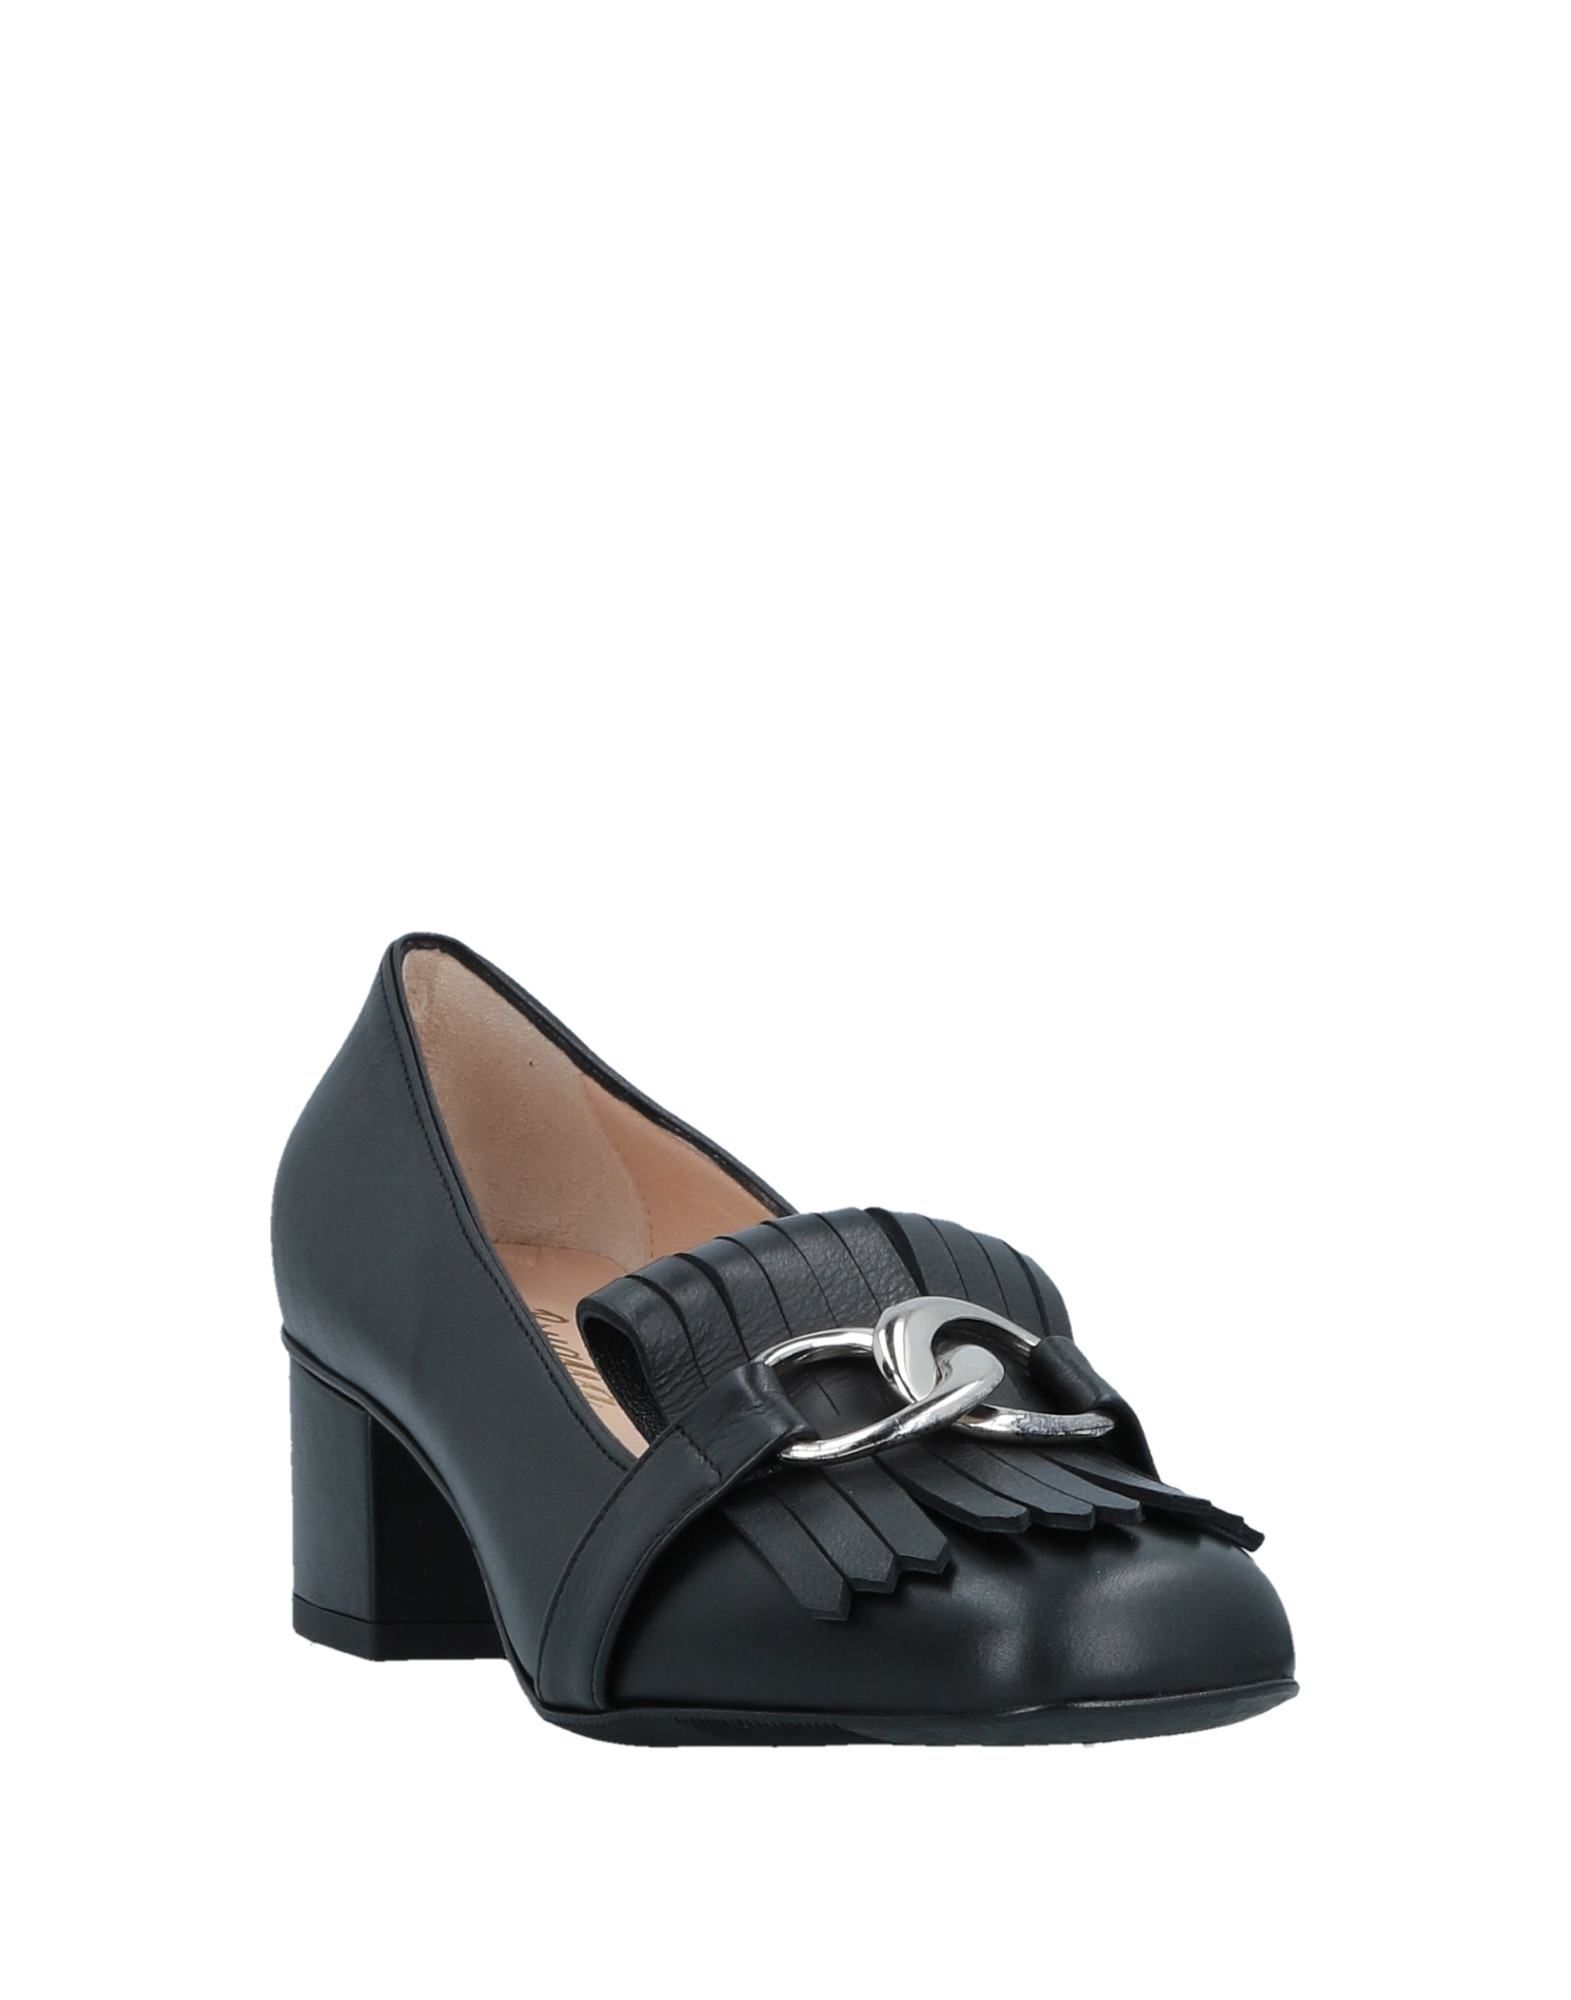 Stilvolle billige Damen Schuhe F.Lli Bruglia Mokassins Damen billige  11517898BV 409fe9